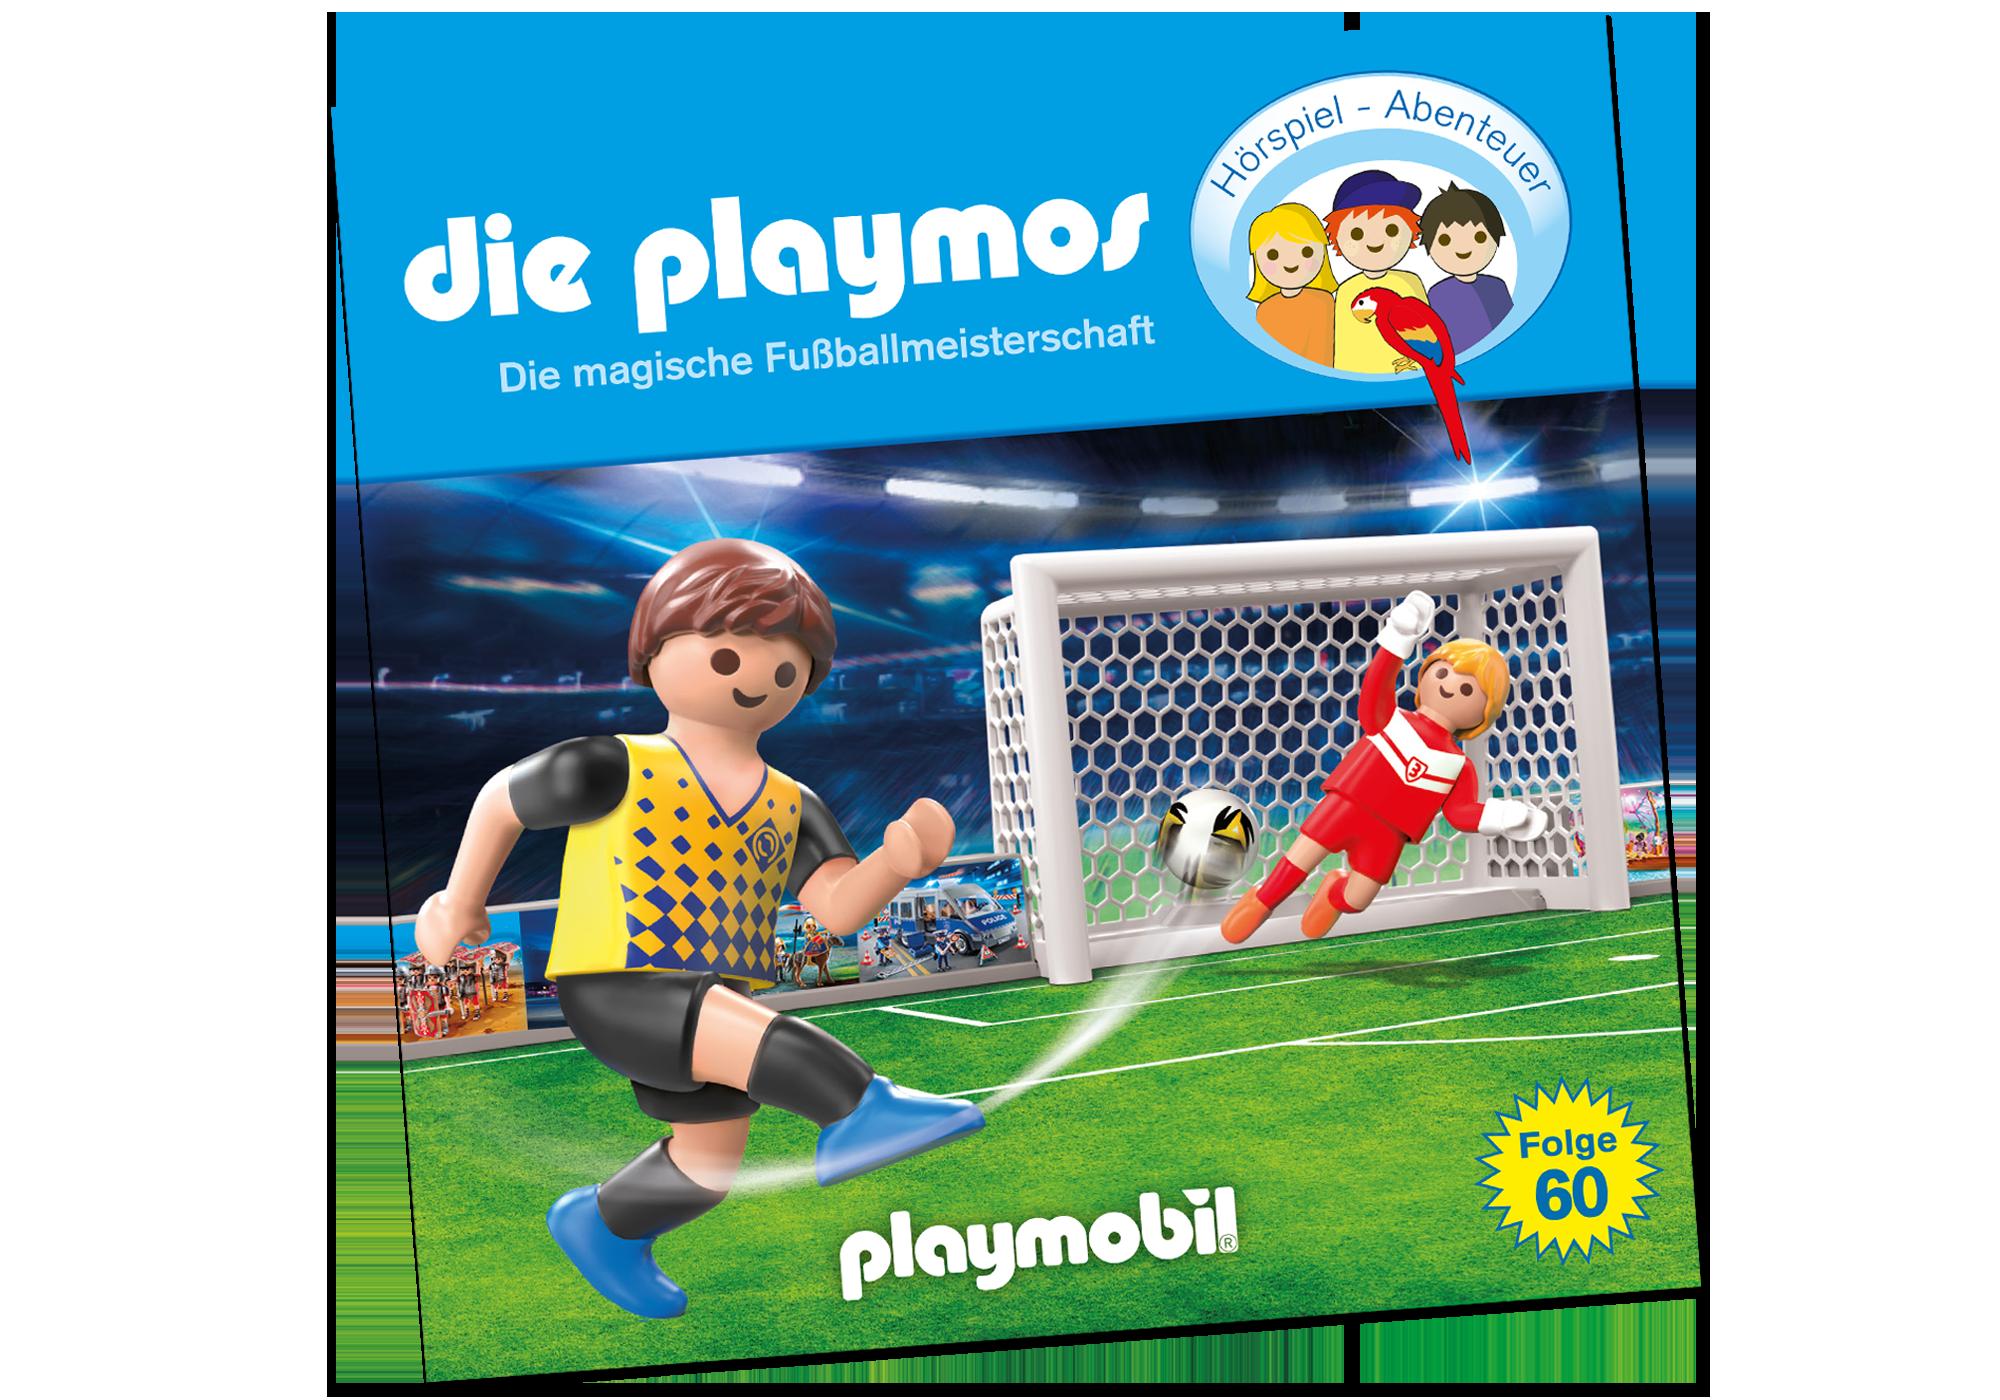 http://media.playmobil.com/i/playmobil/80063_product_detail/Die magische Fußballmeisterschaft - Folge 60